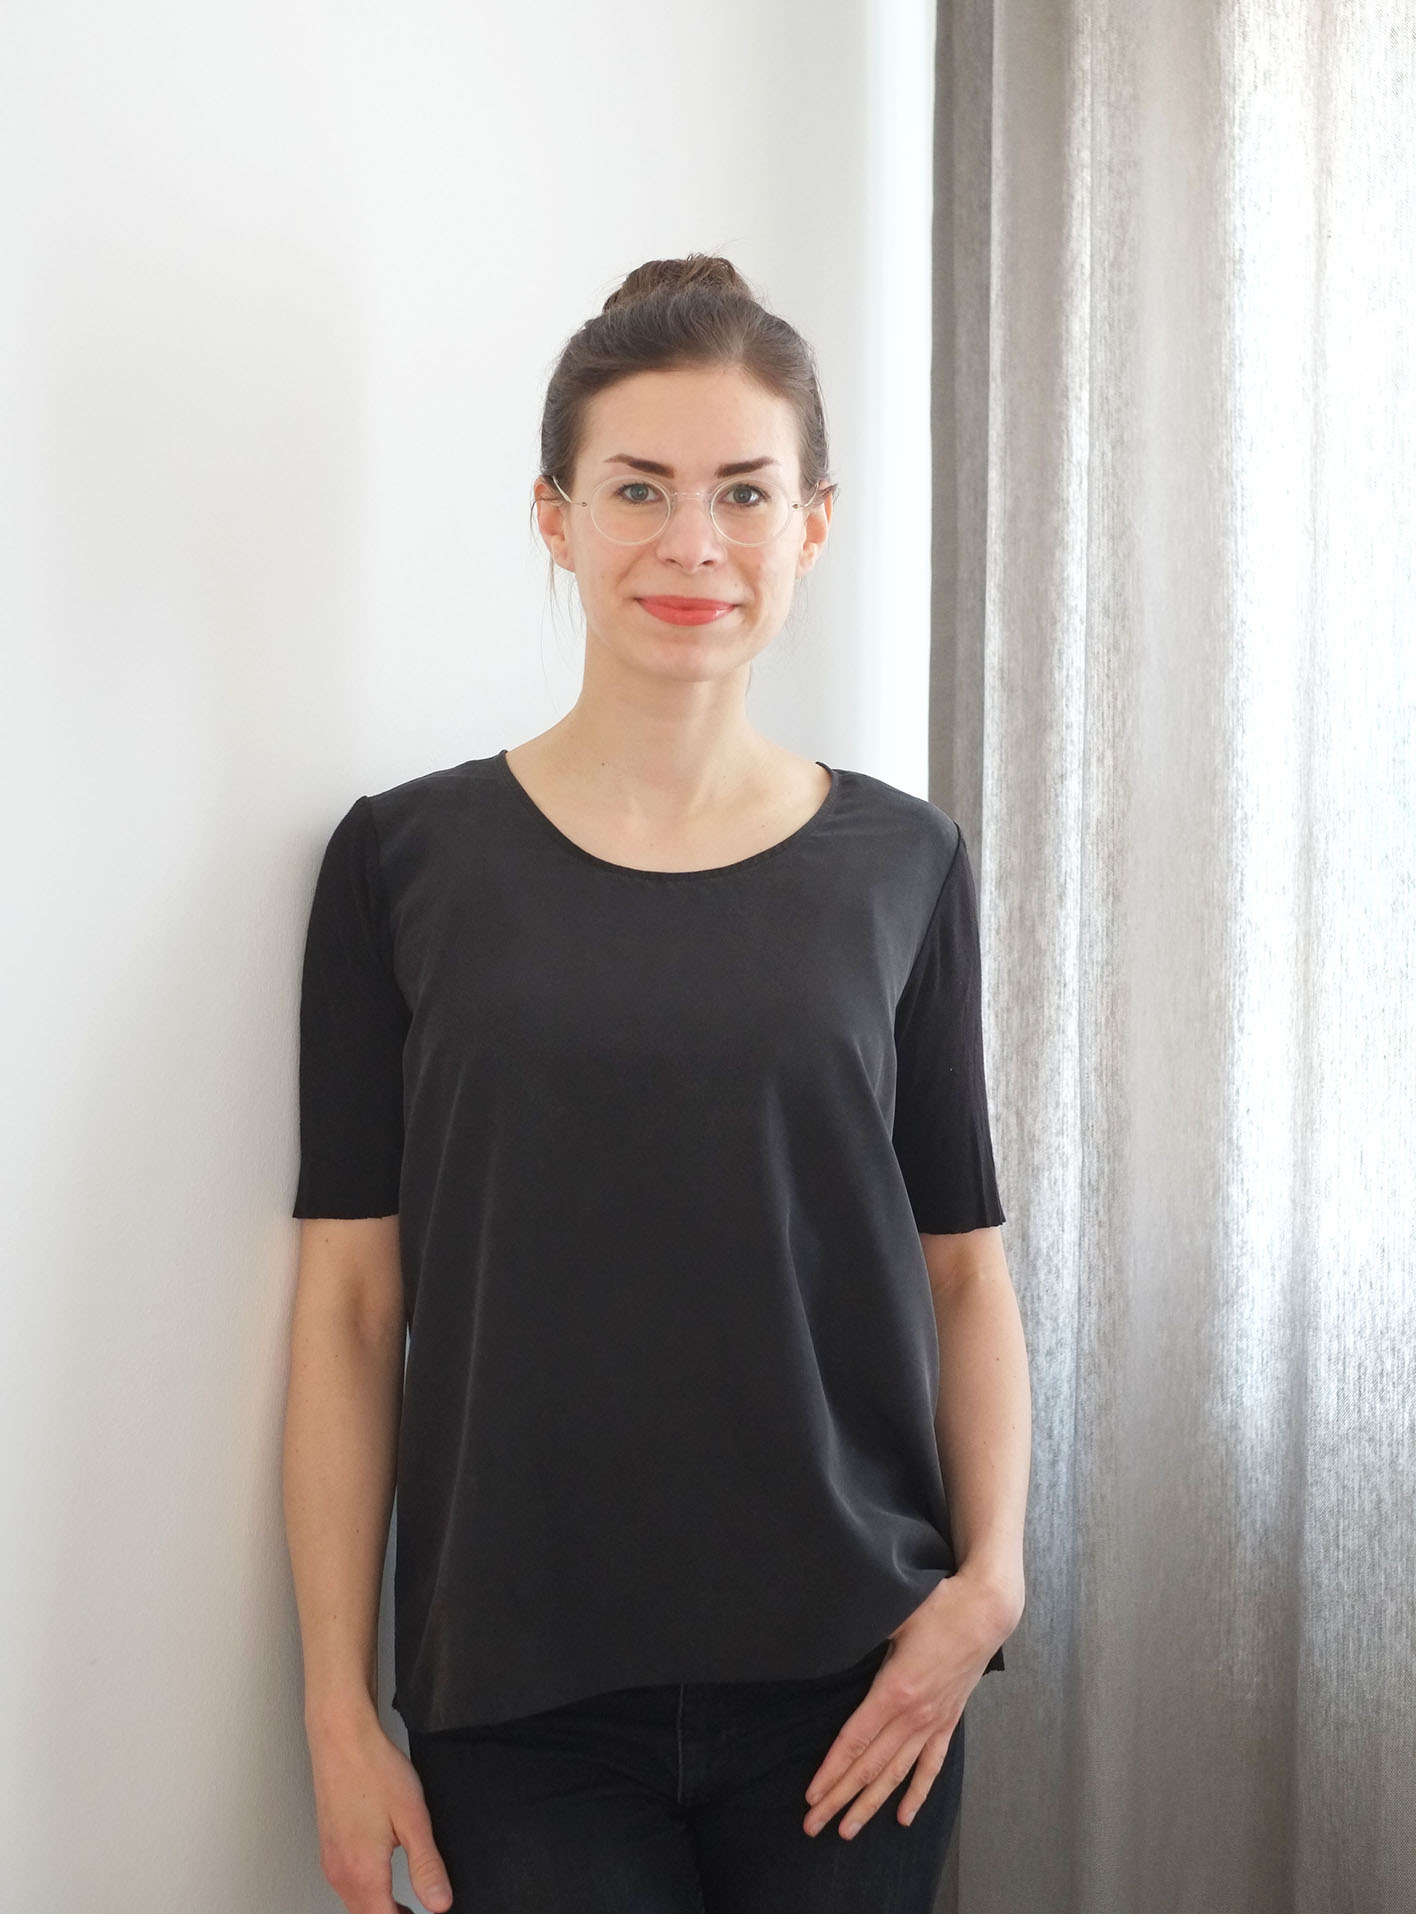 Sarah Schroeder Mindt Designstudio